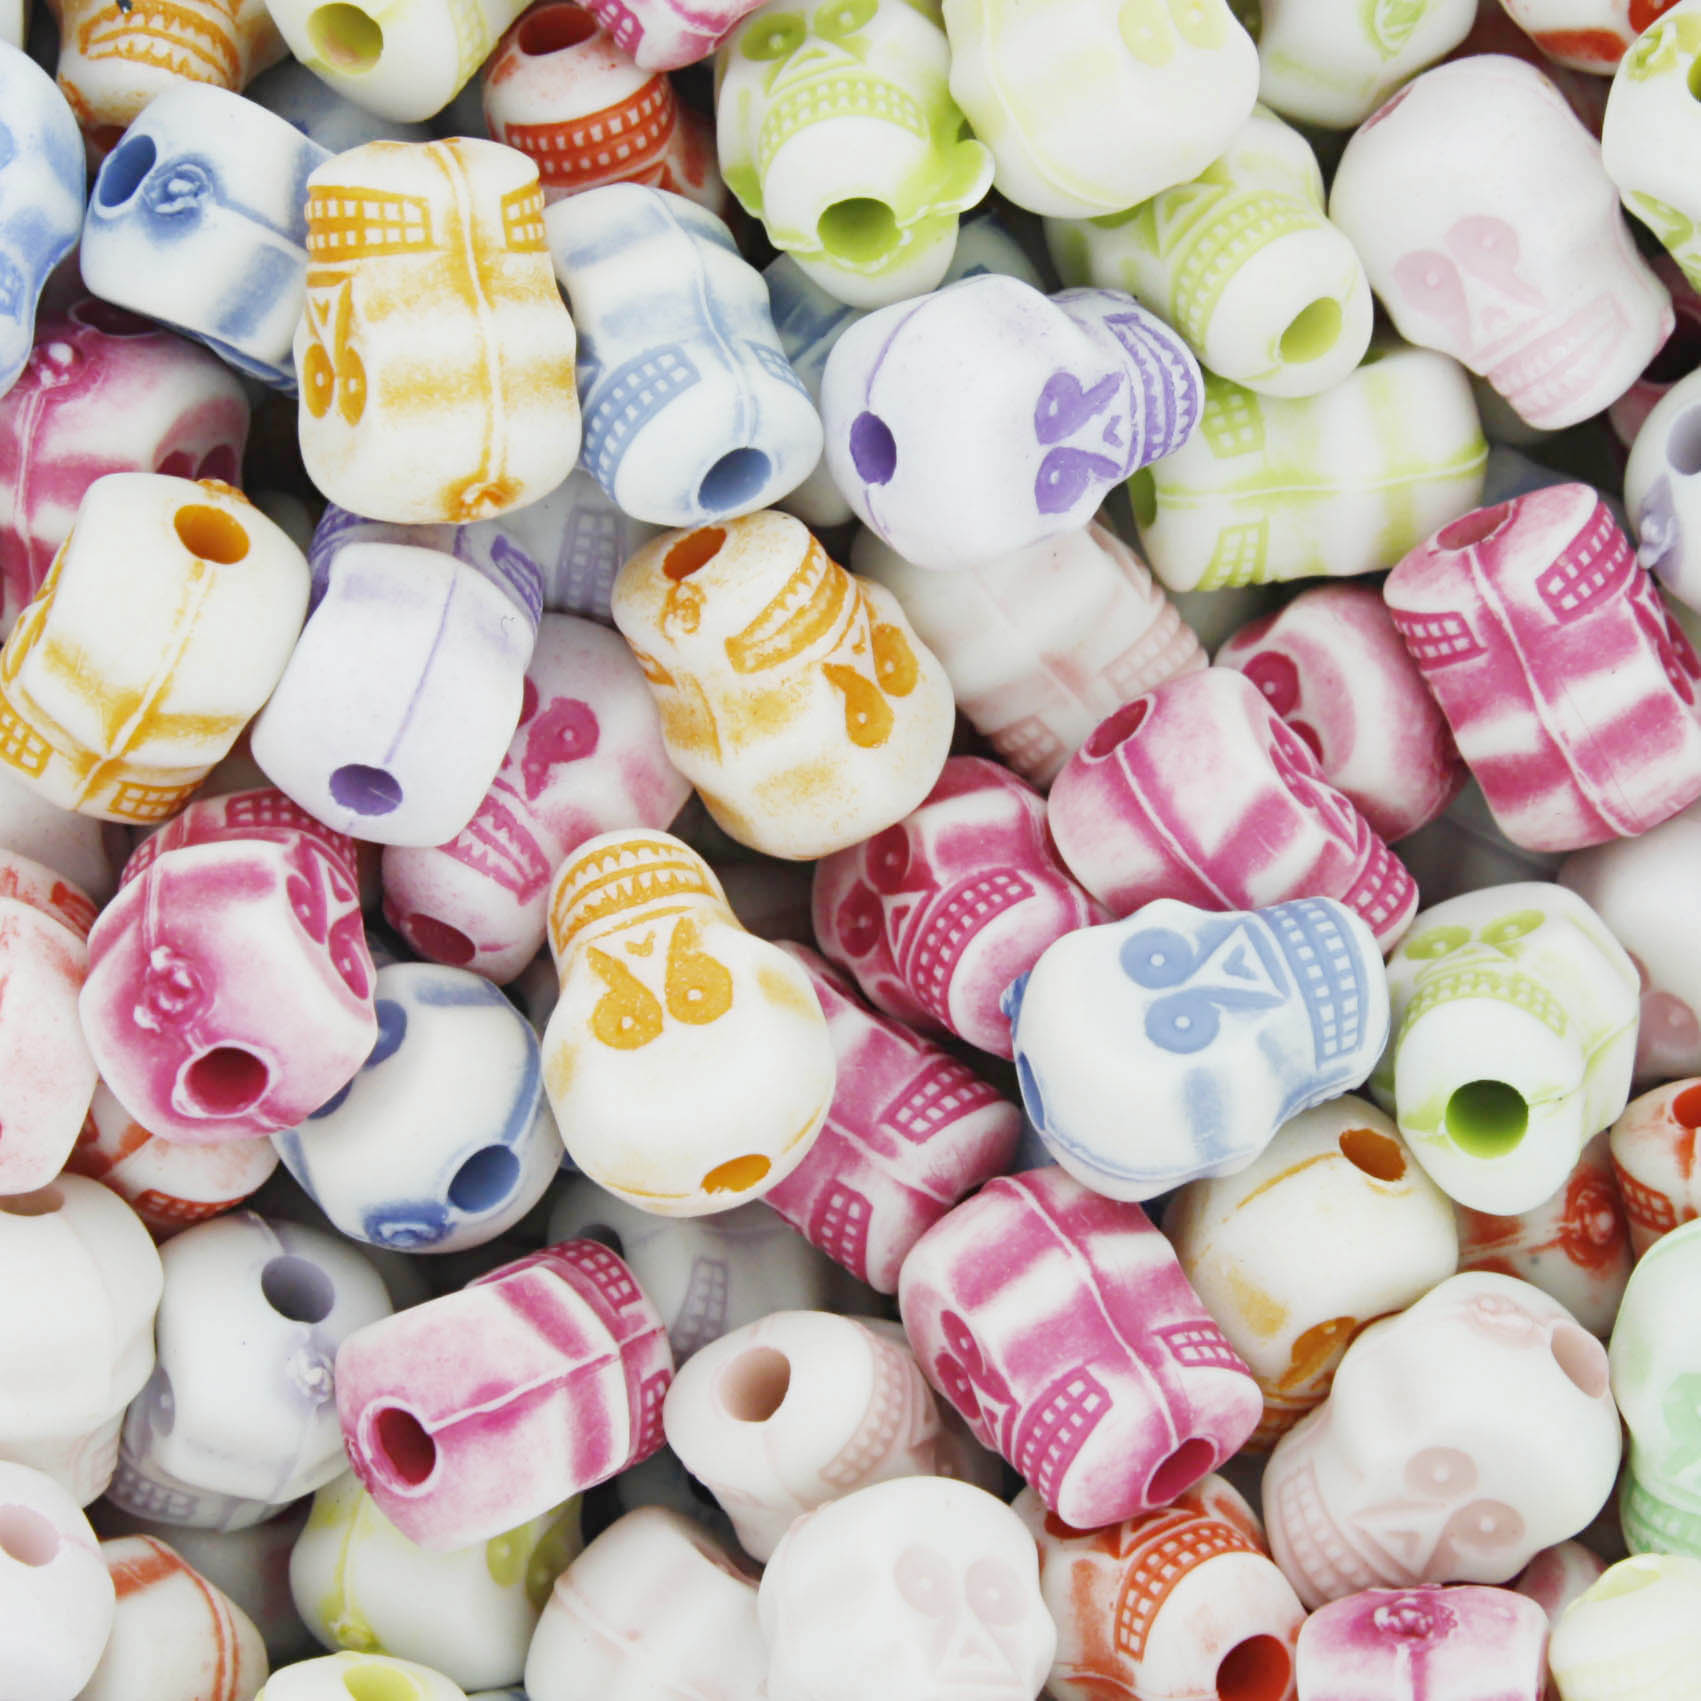 Miçanga Colorida / Infantil - Caveirinhas  - Stéphanie Bijoux® - Peças para Bijuterias e Artesanato